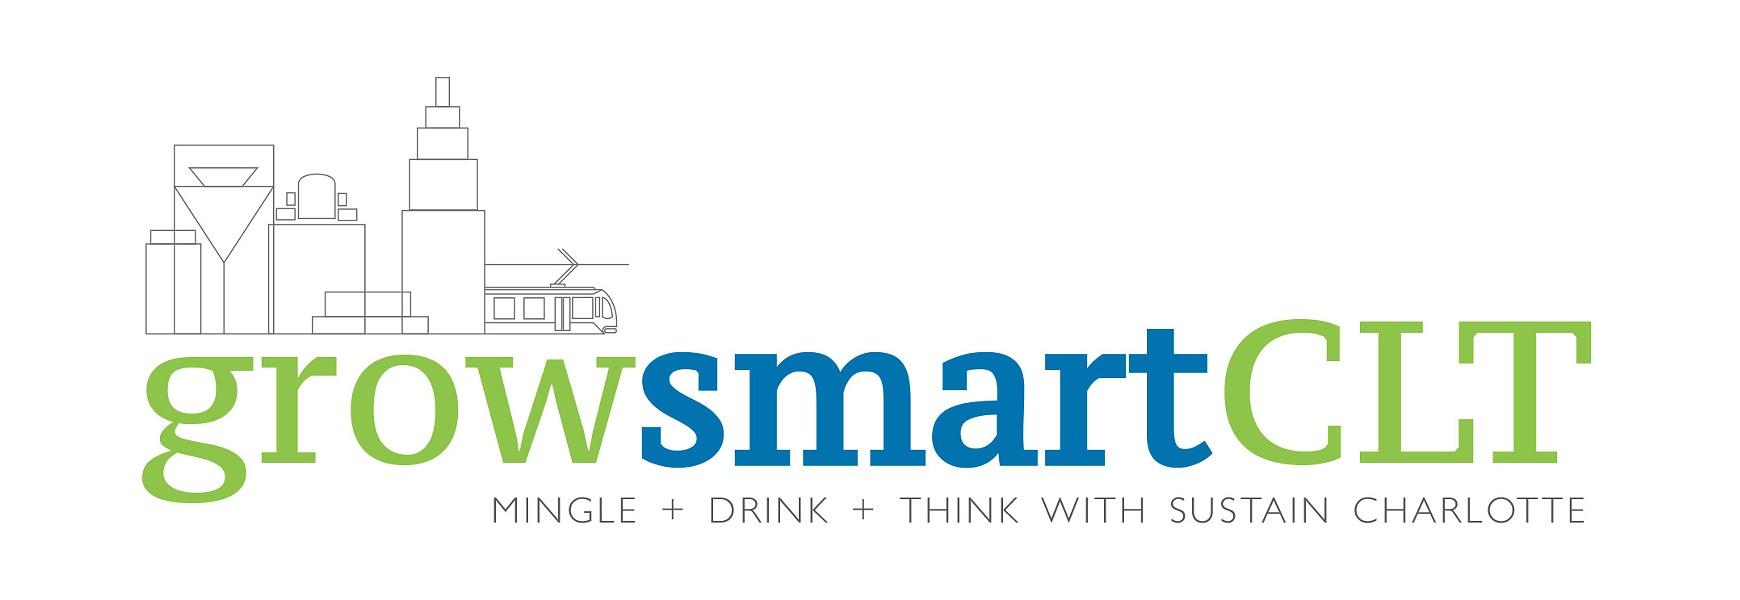 growsmart_logo.jpg